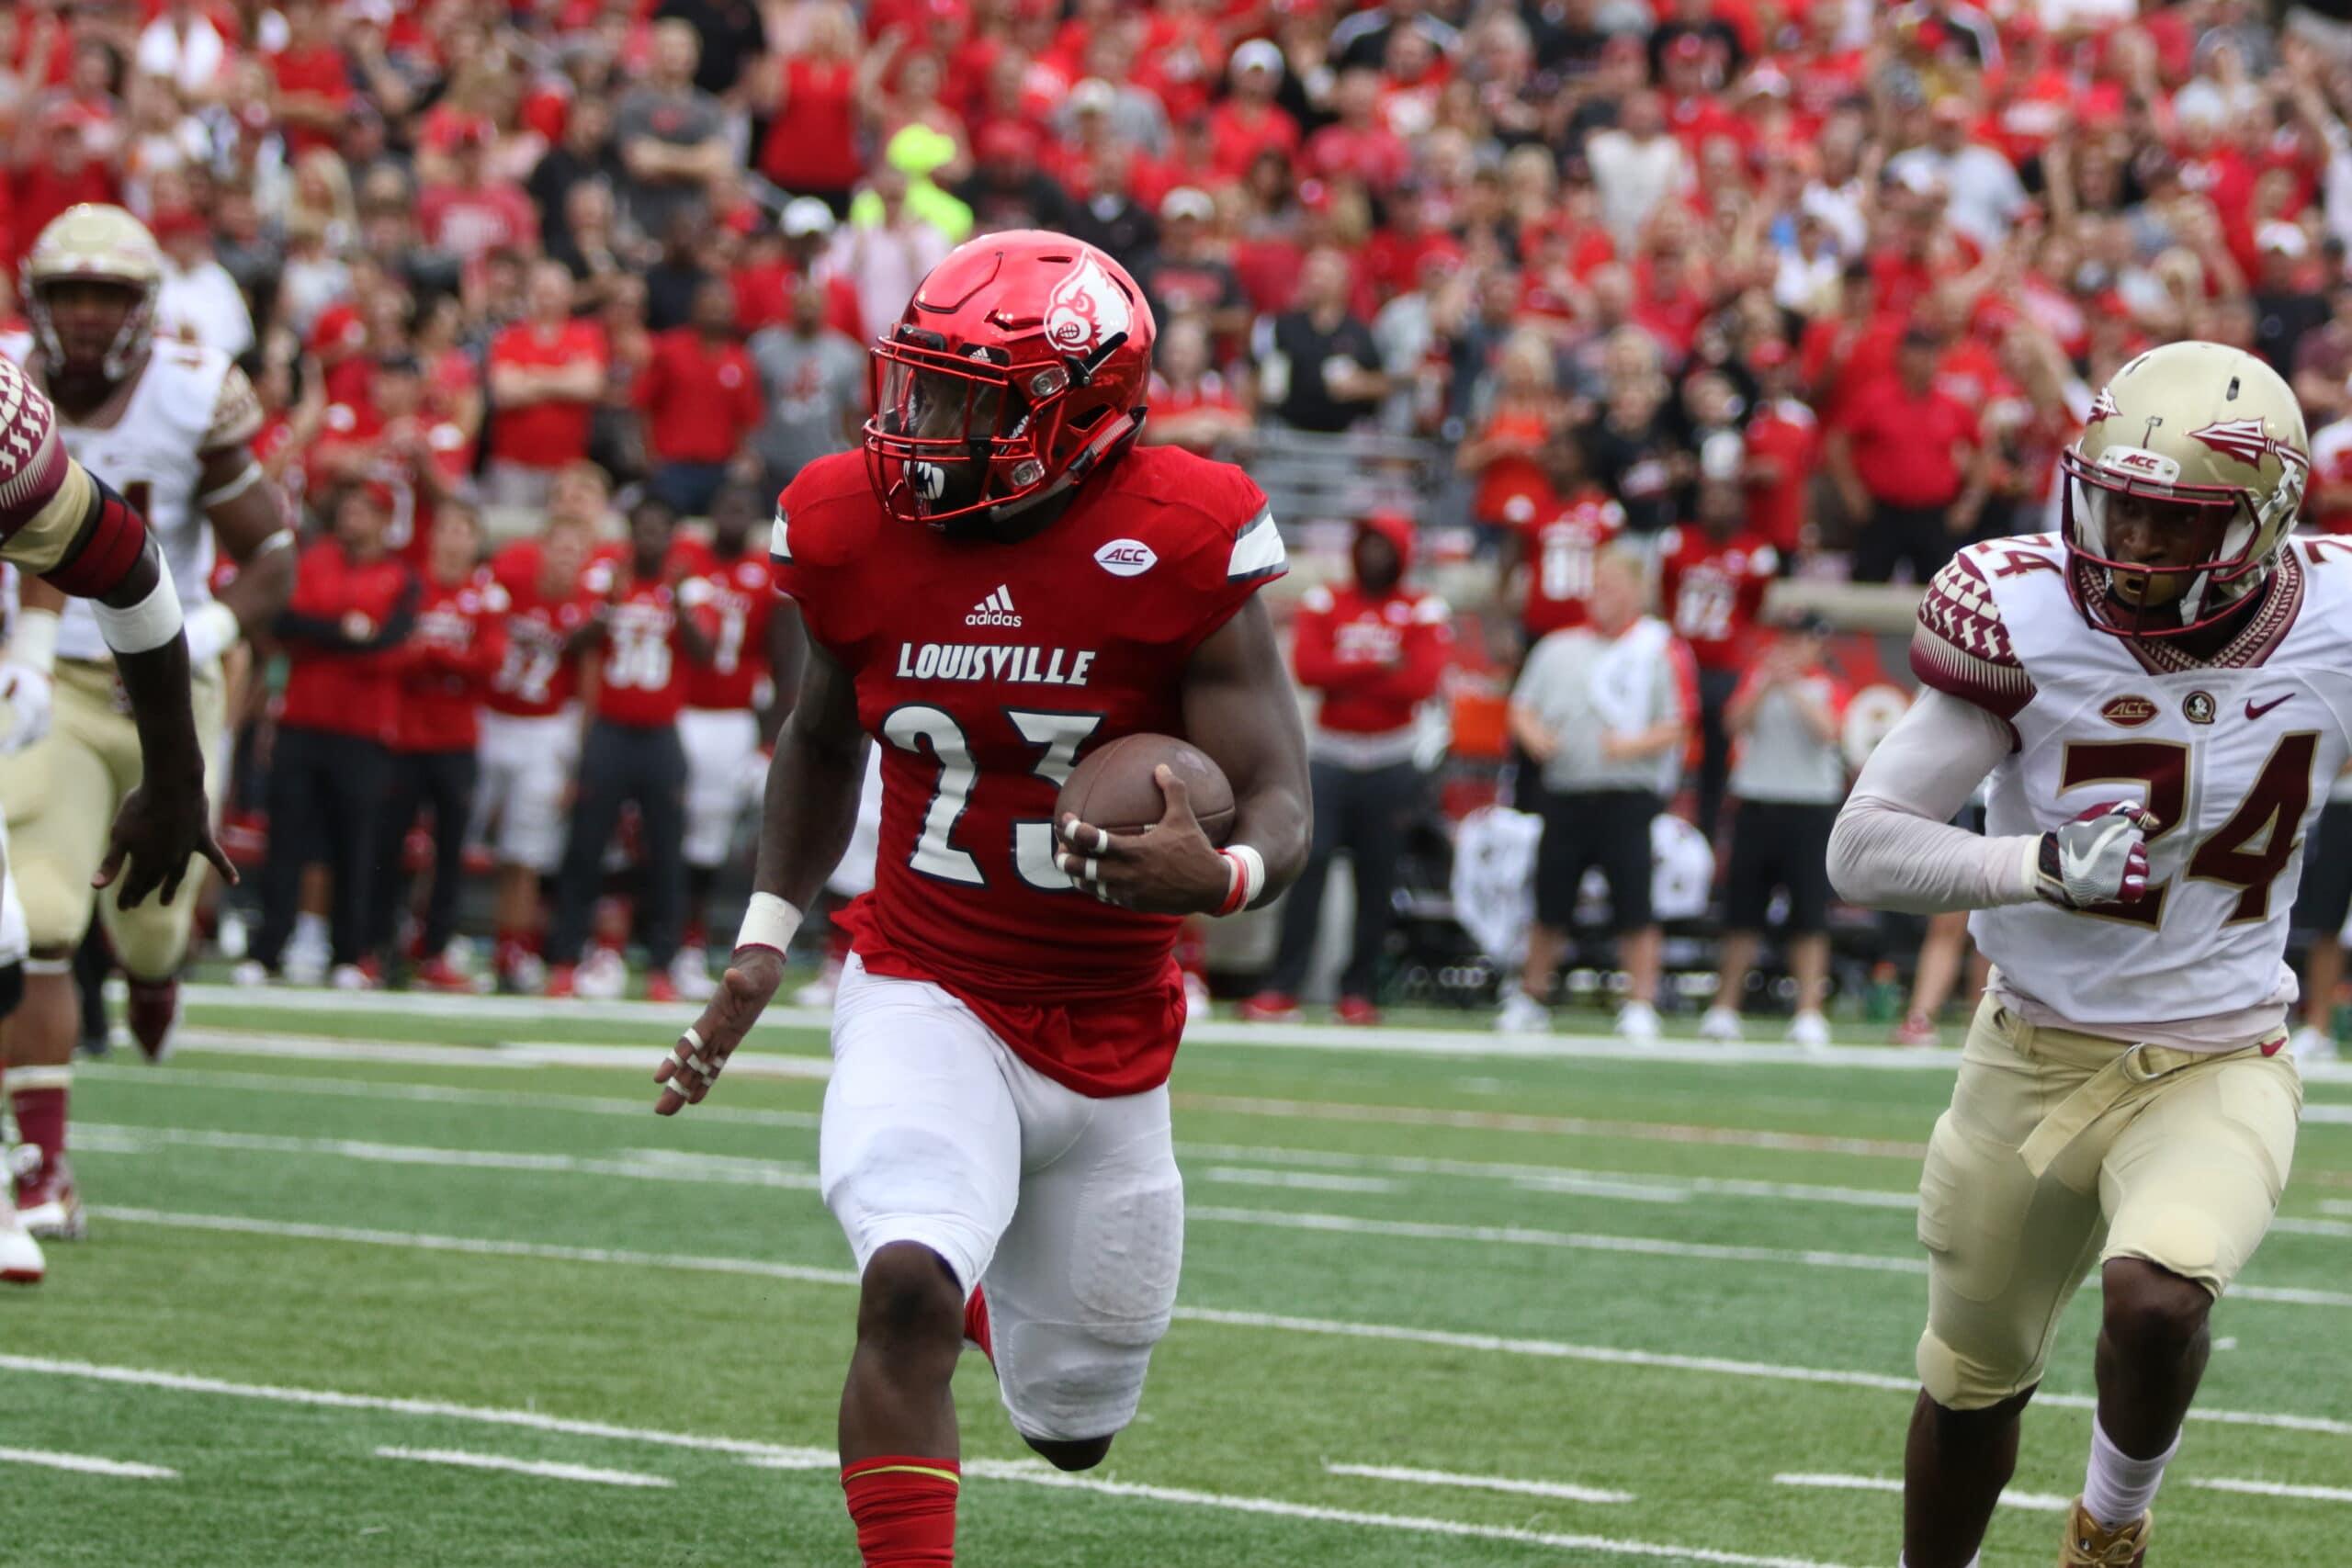 Meet the Athlete: Brandon Radcliff • The Louisville Cardinal